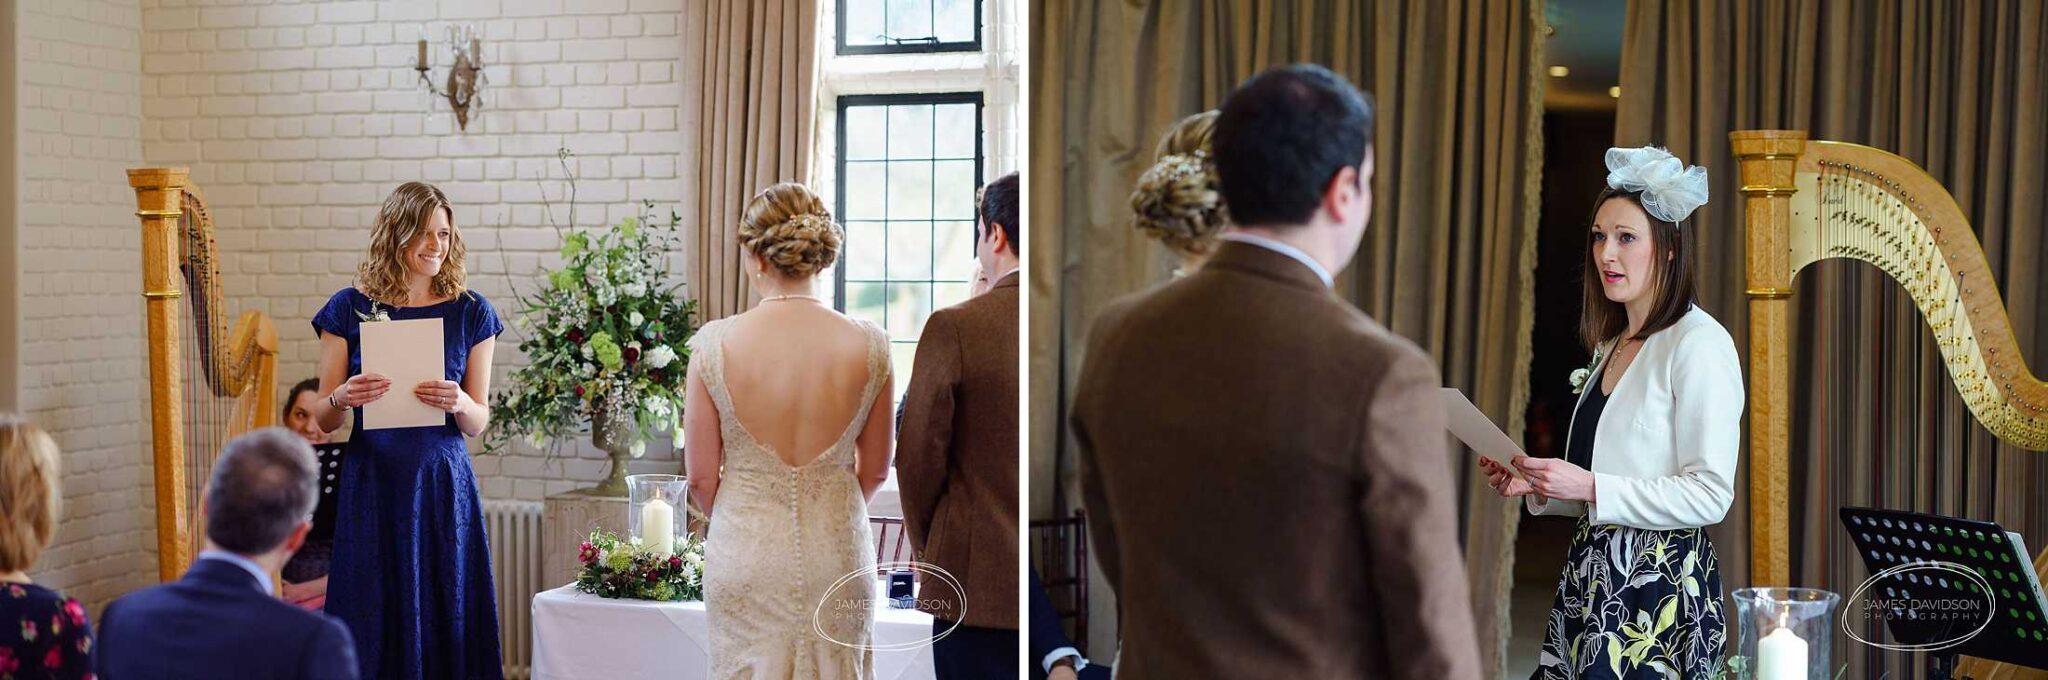 seckford-hall-wedding-035